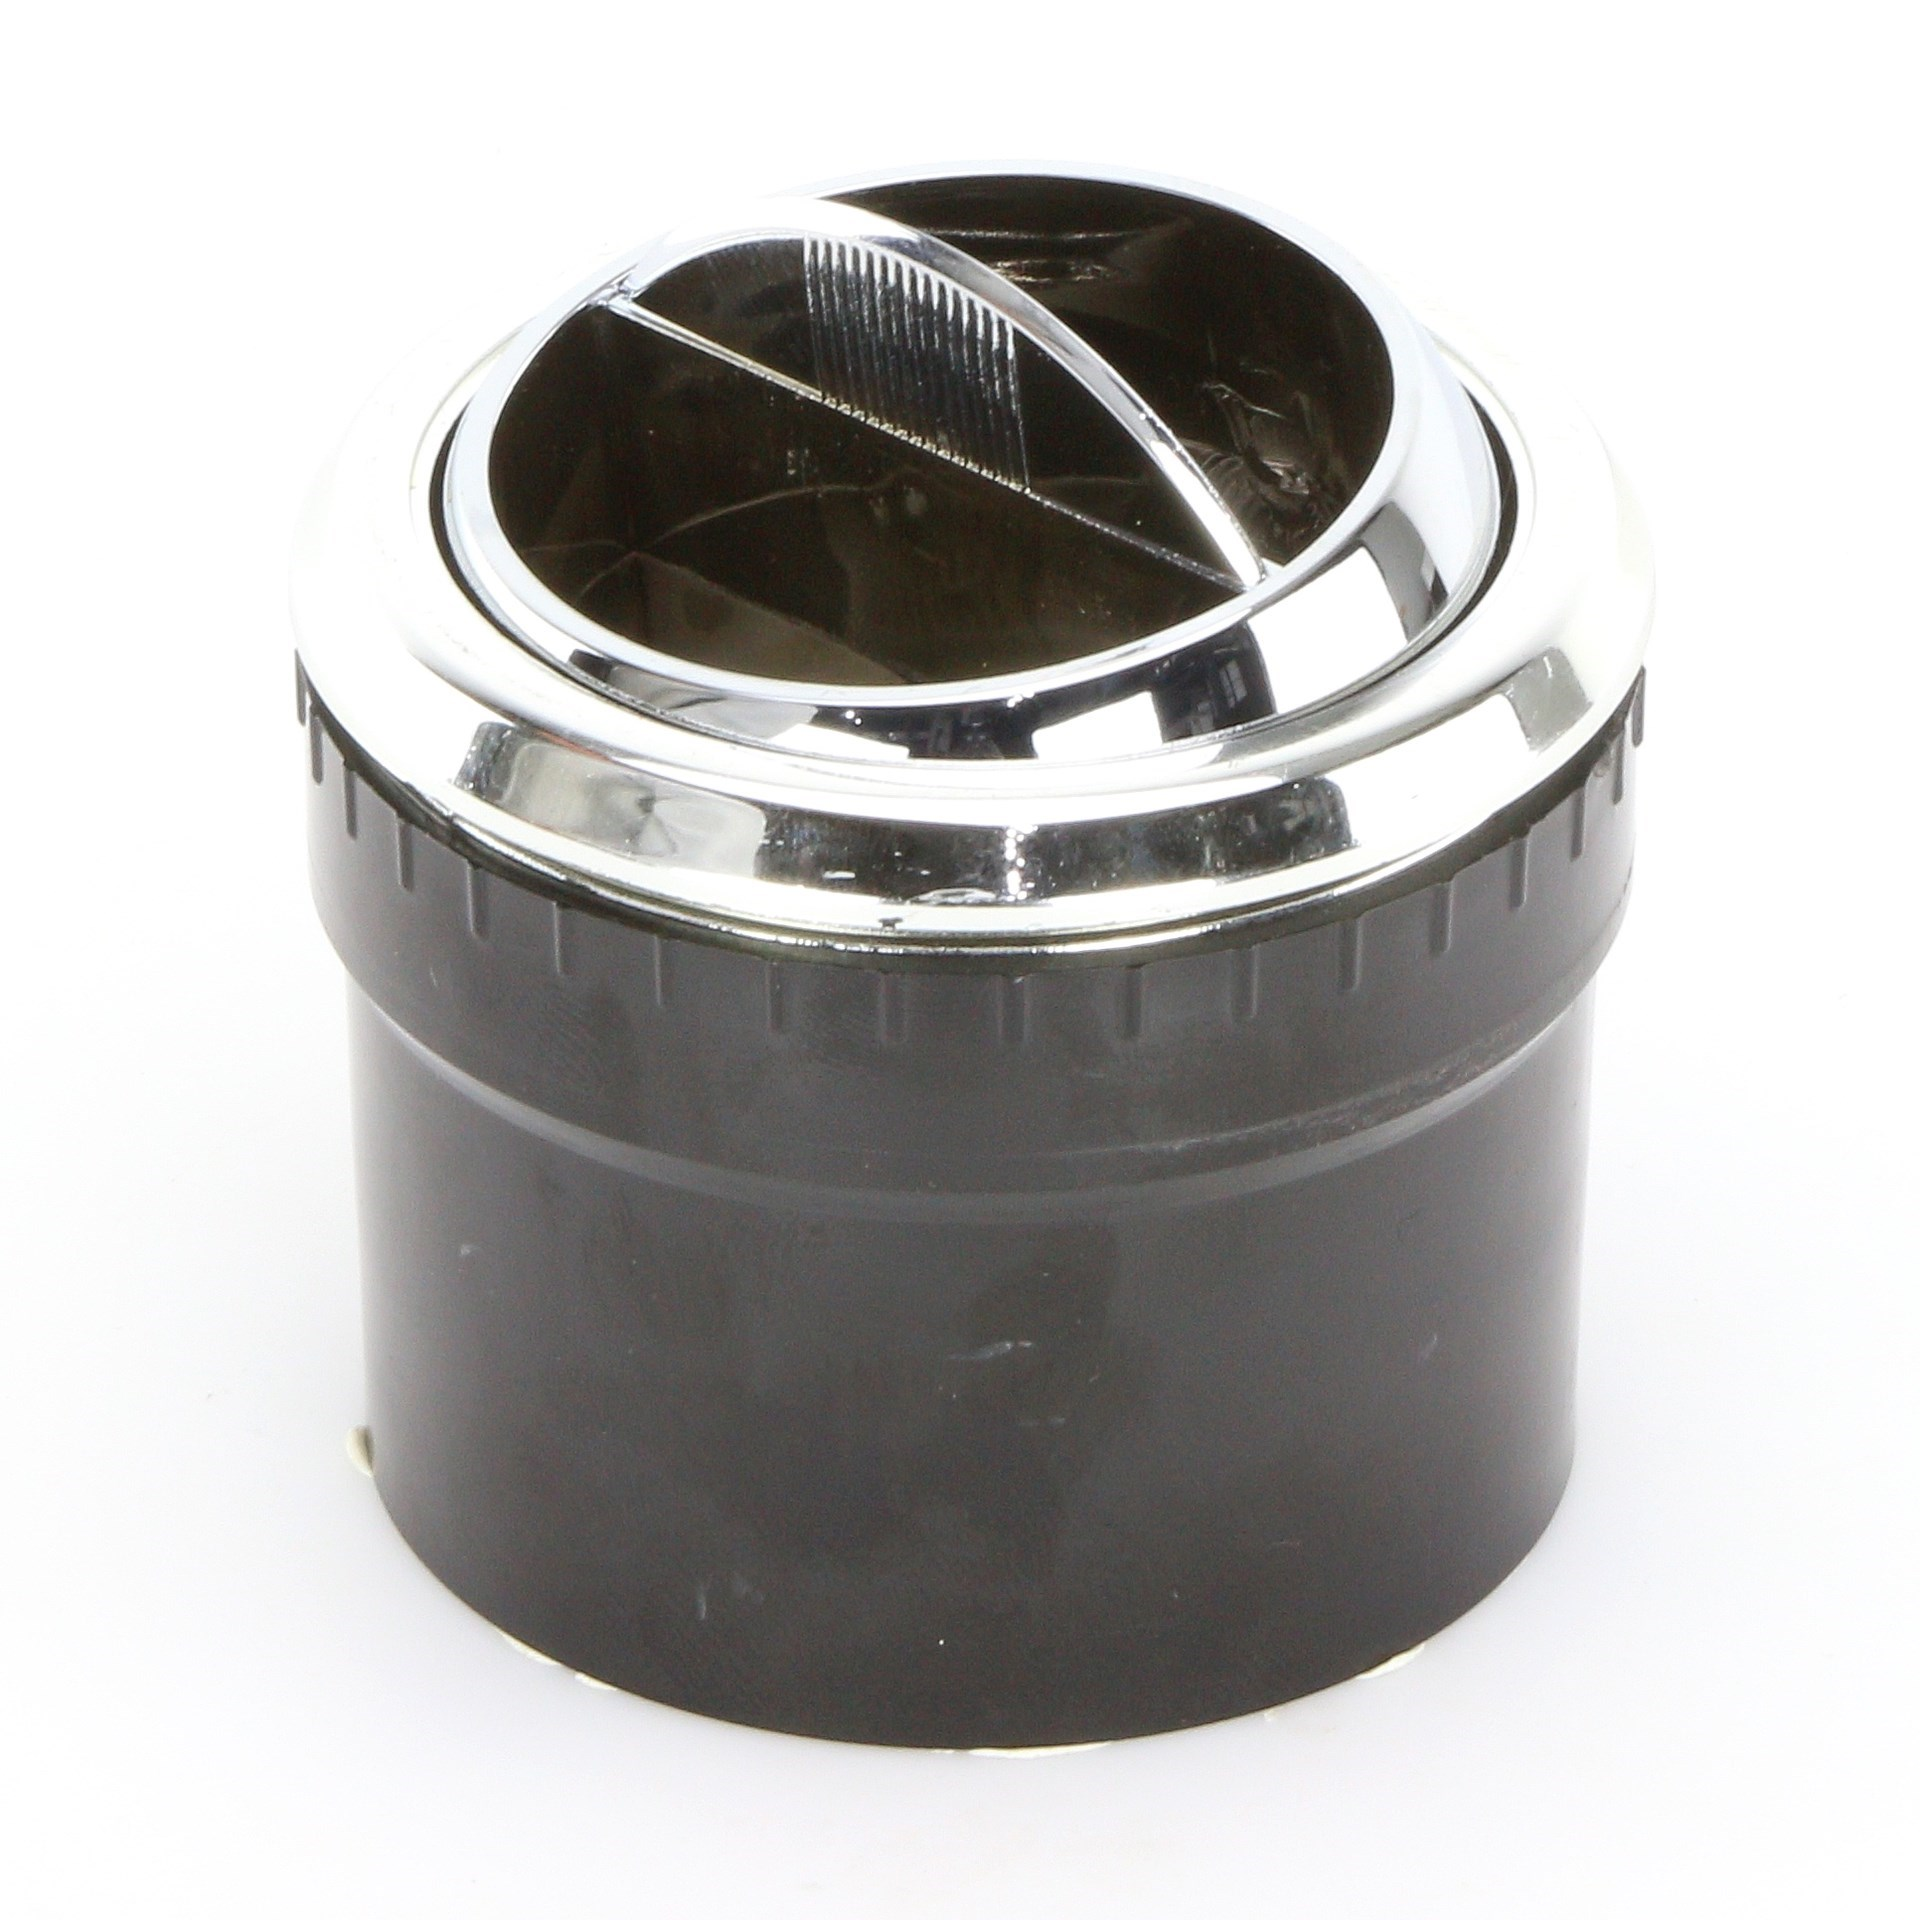 84mm Chrome Bezel Rocking Vane Dashboard Heater//Air Vent For Kit Car Rally